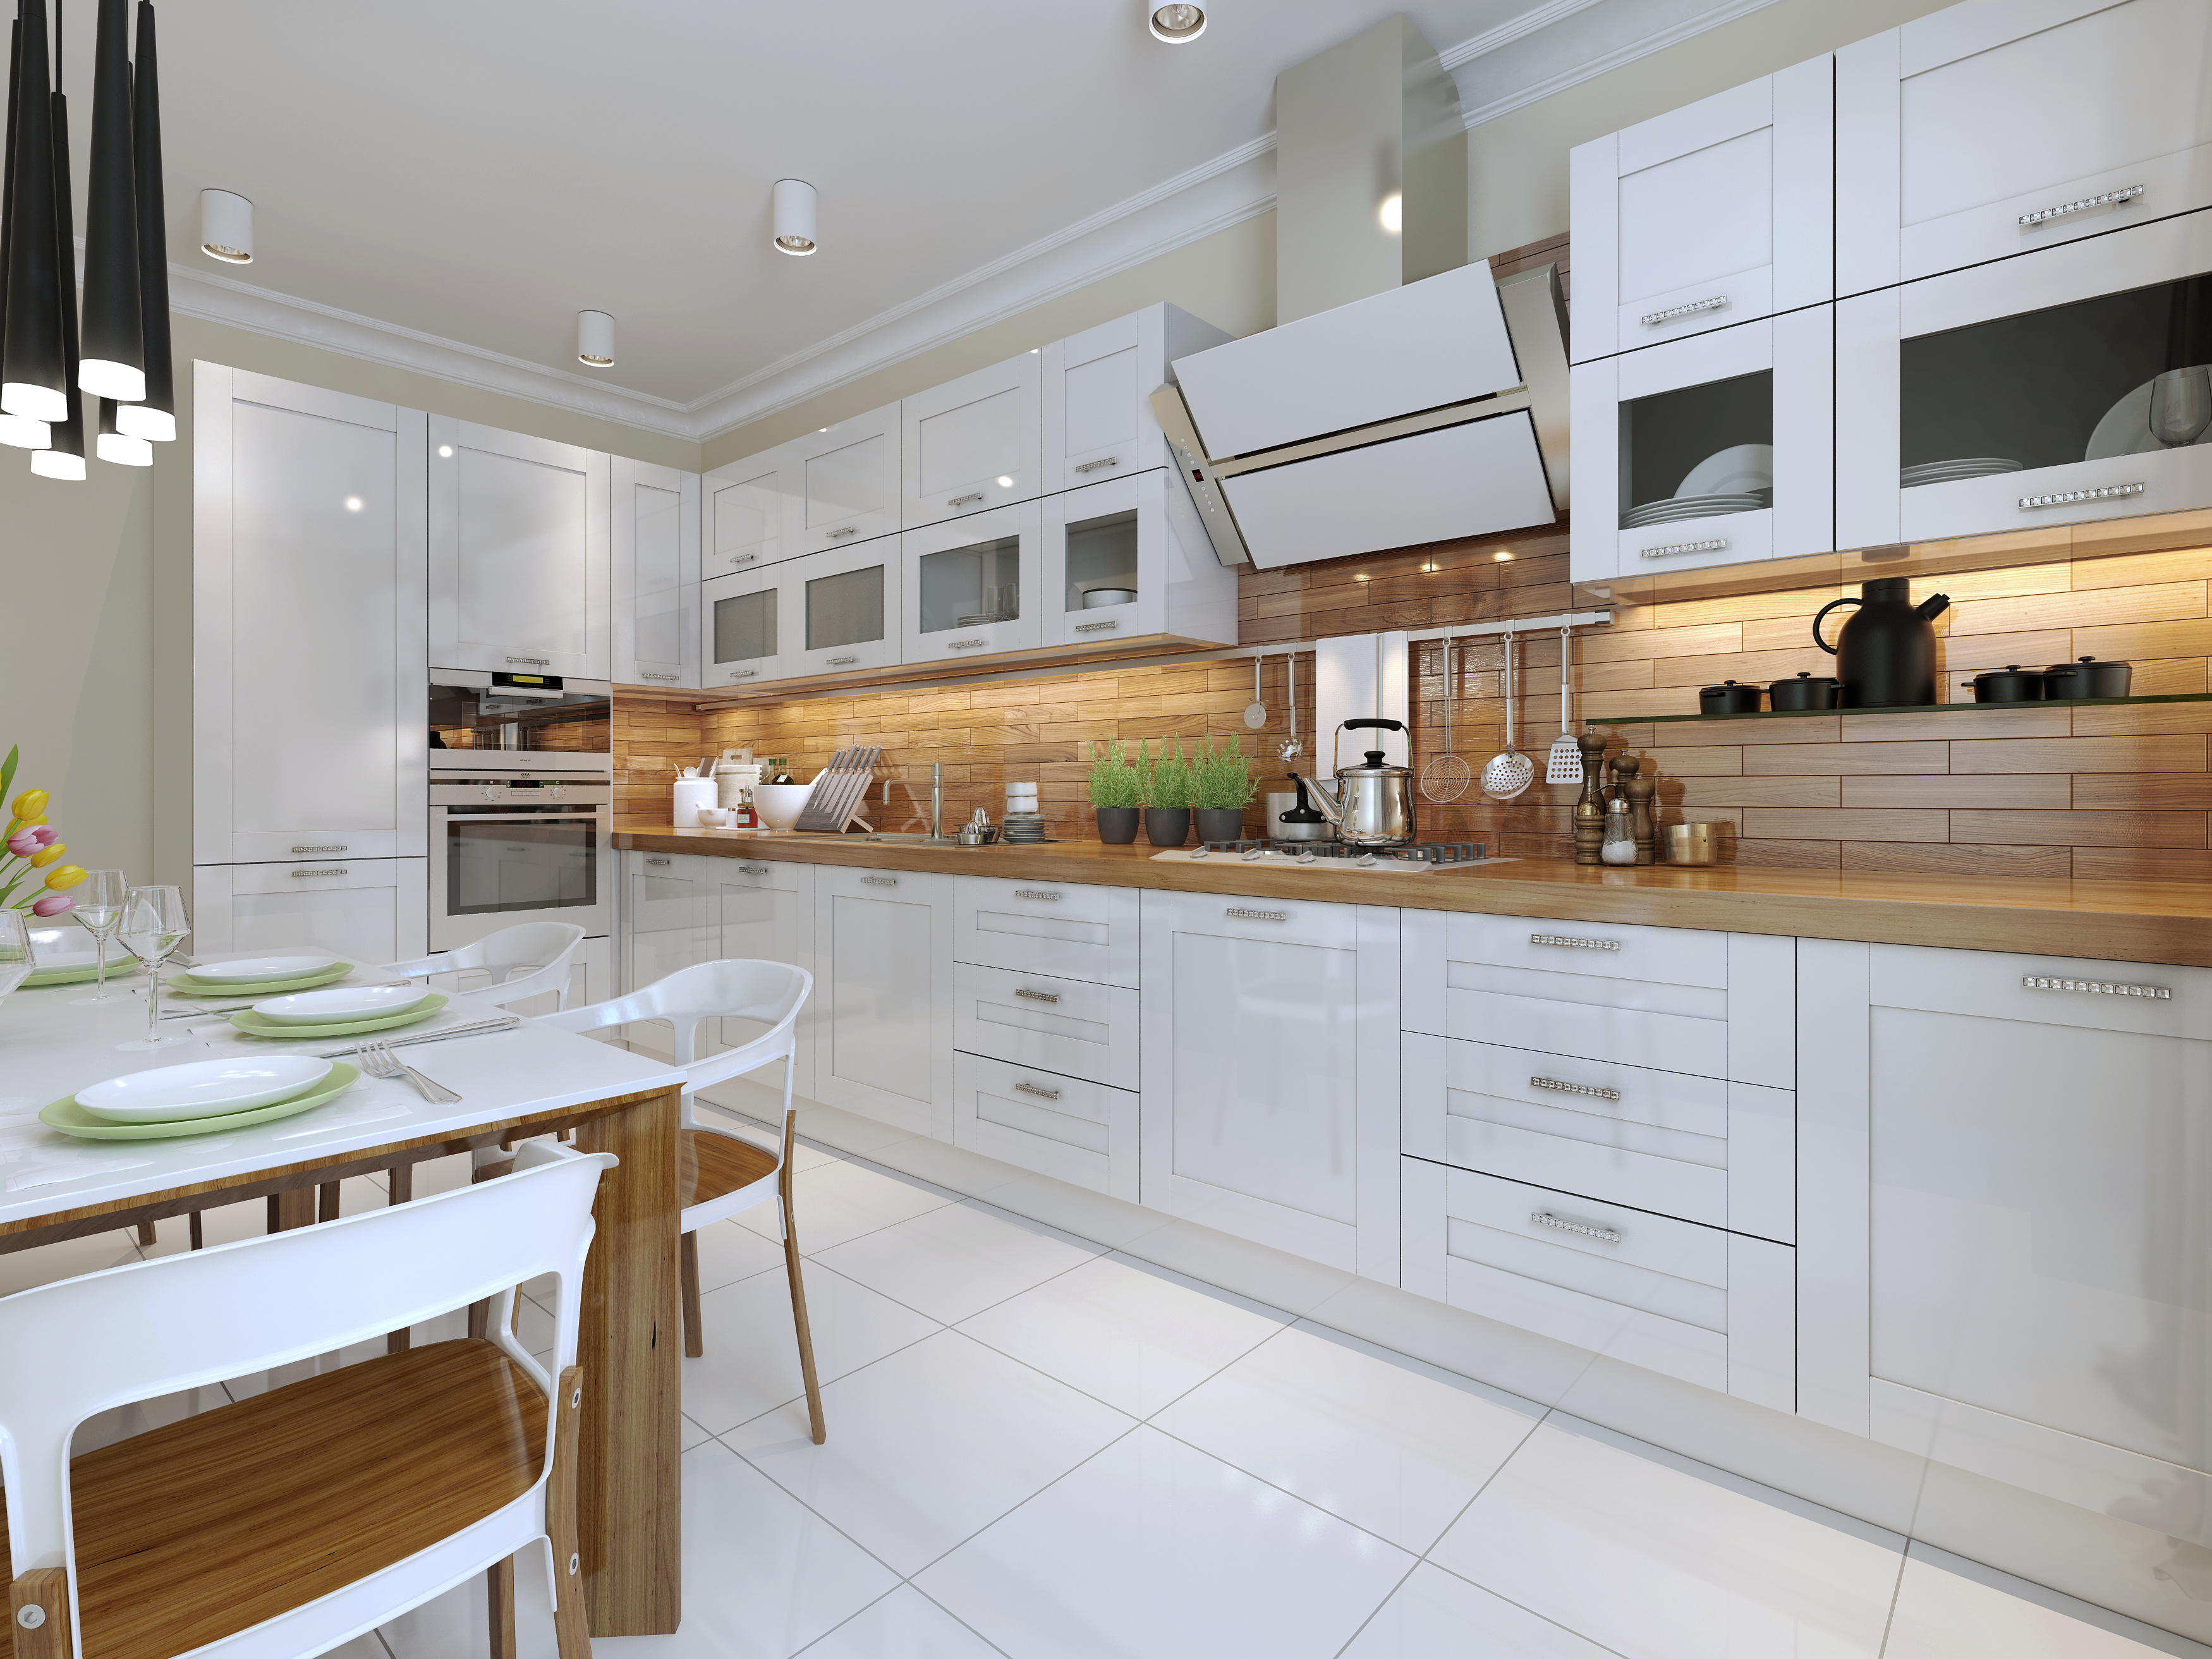 italian kitchen decorating ideas luxury home interior design ideas